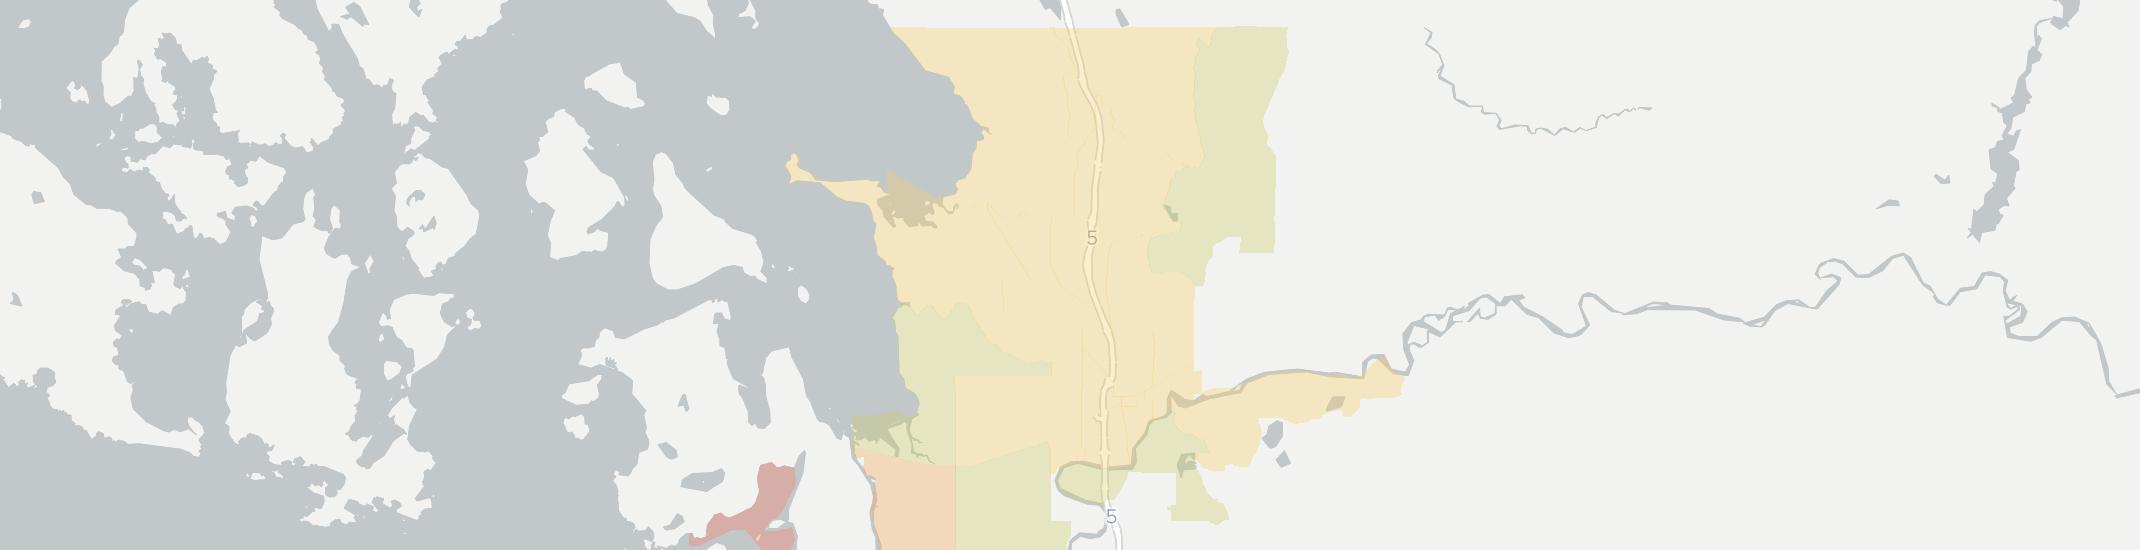 Burlington Internet Competition Map. Click for interactive map.